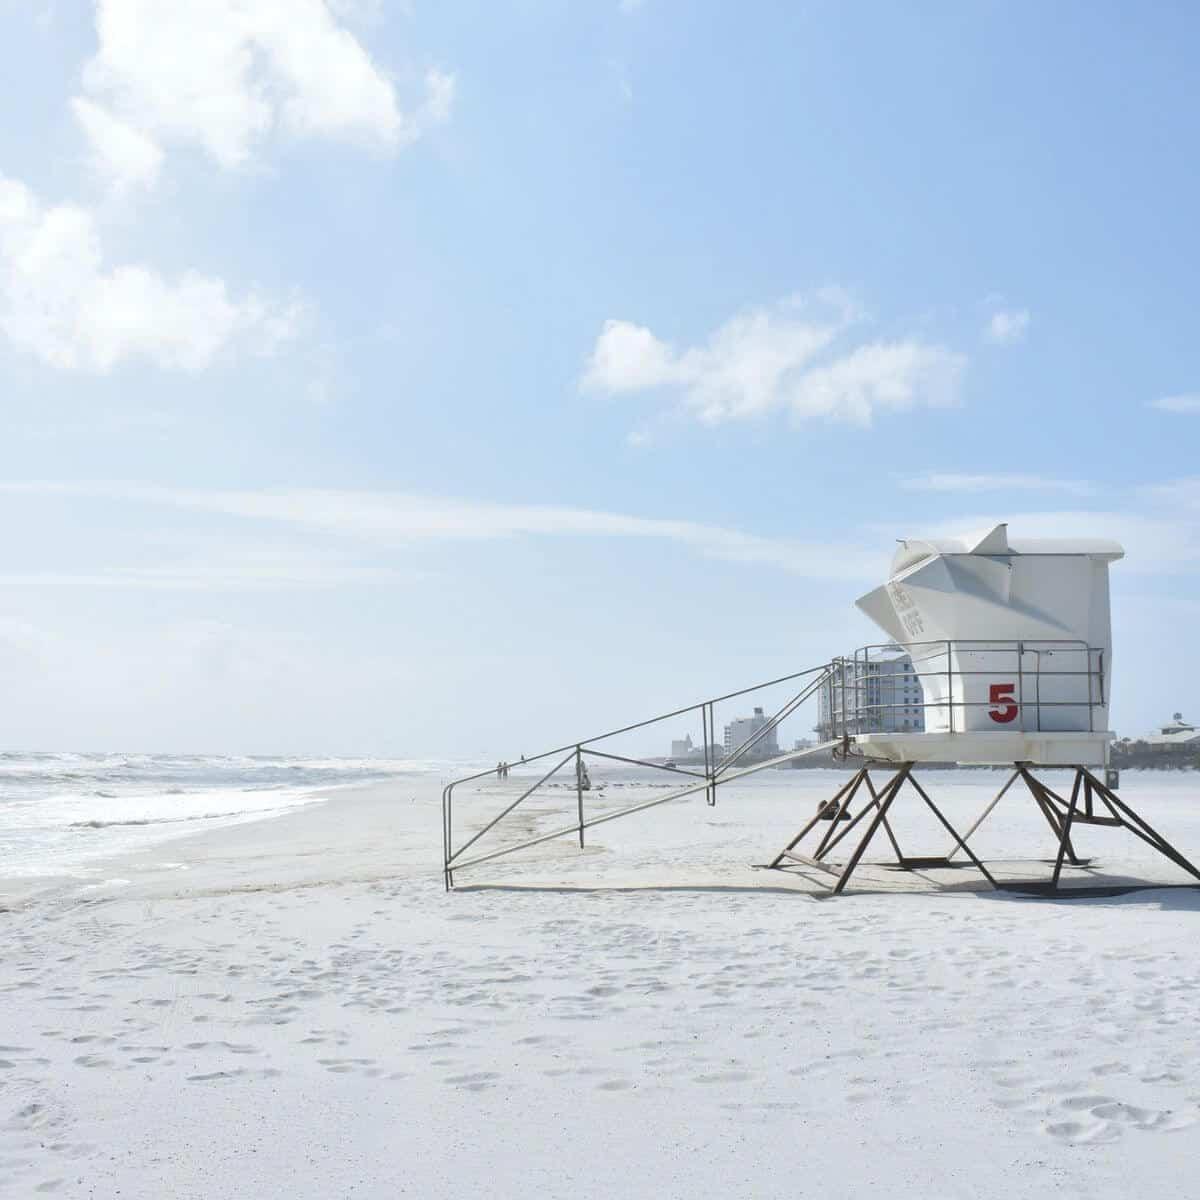 Lifeguard tower on a white sand beach.